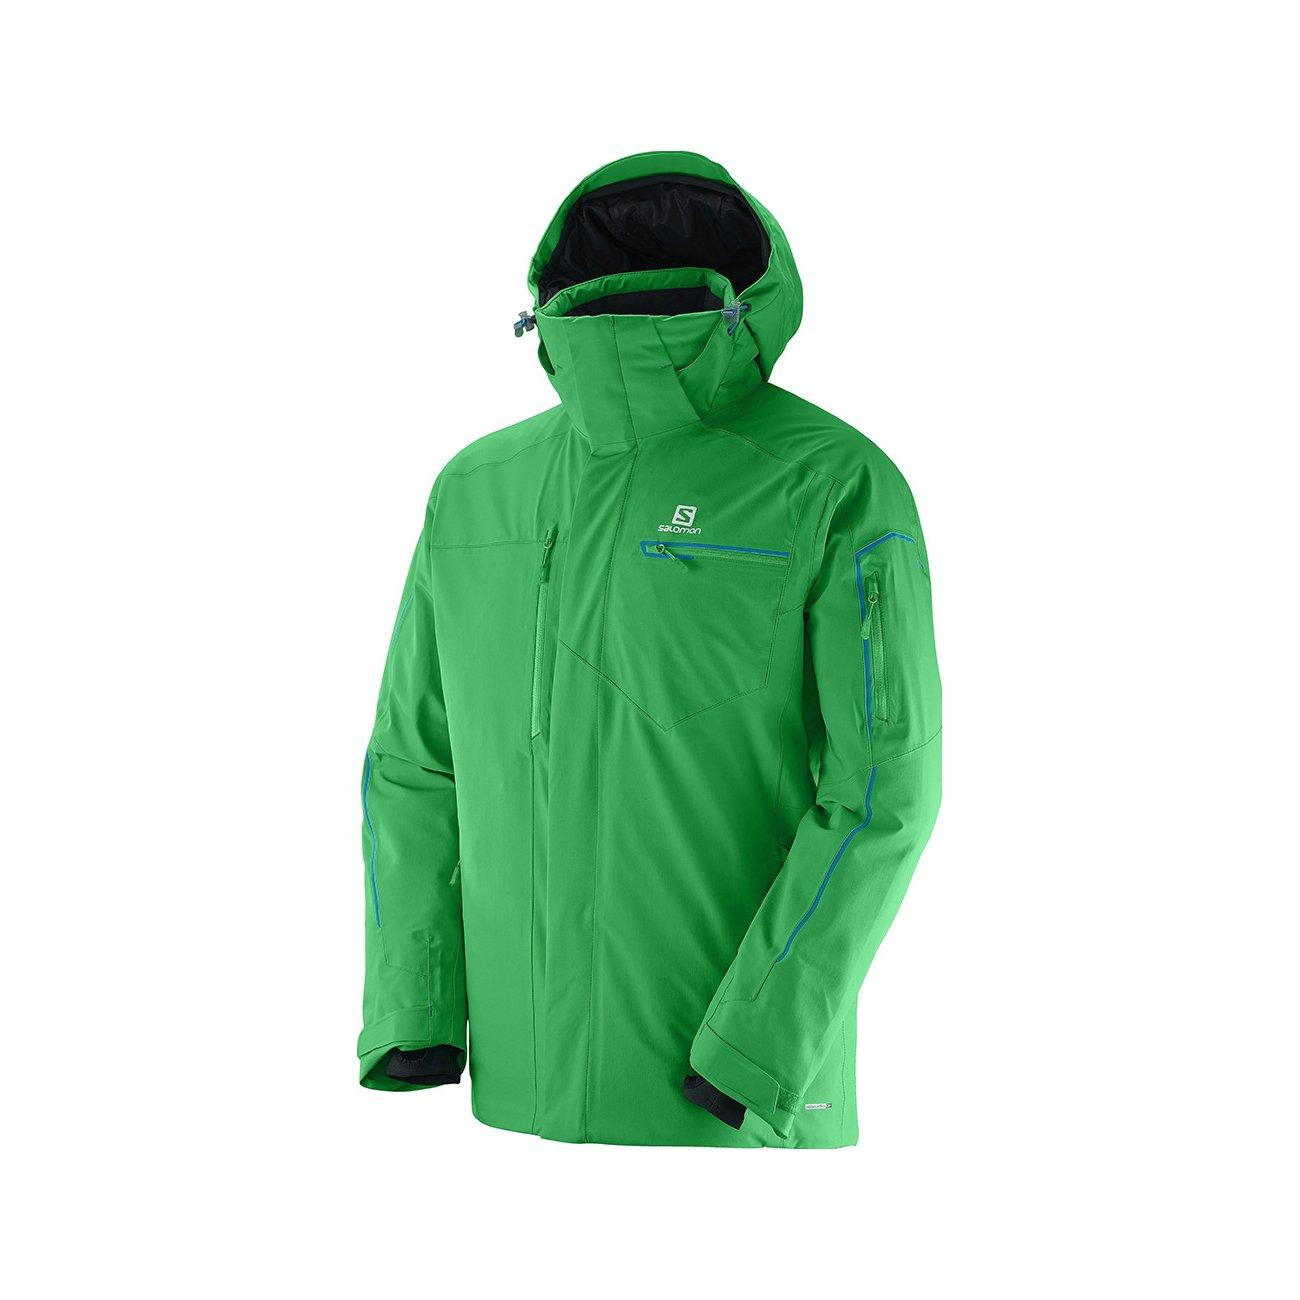 Salomon BRILLANT jacket